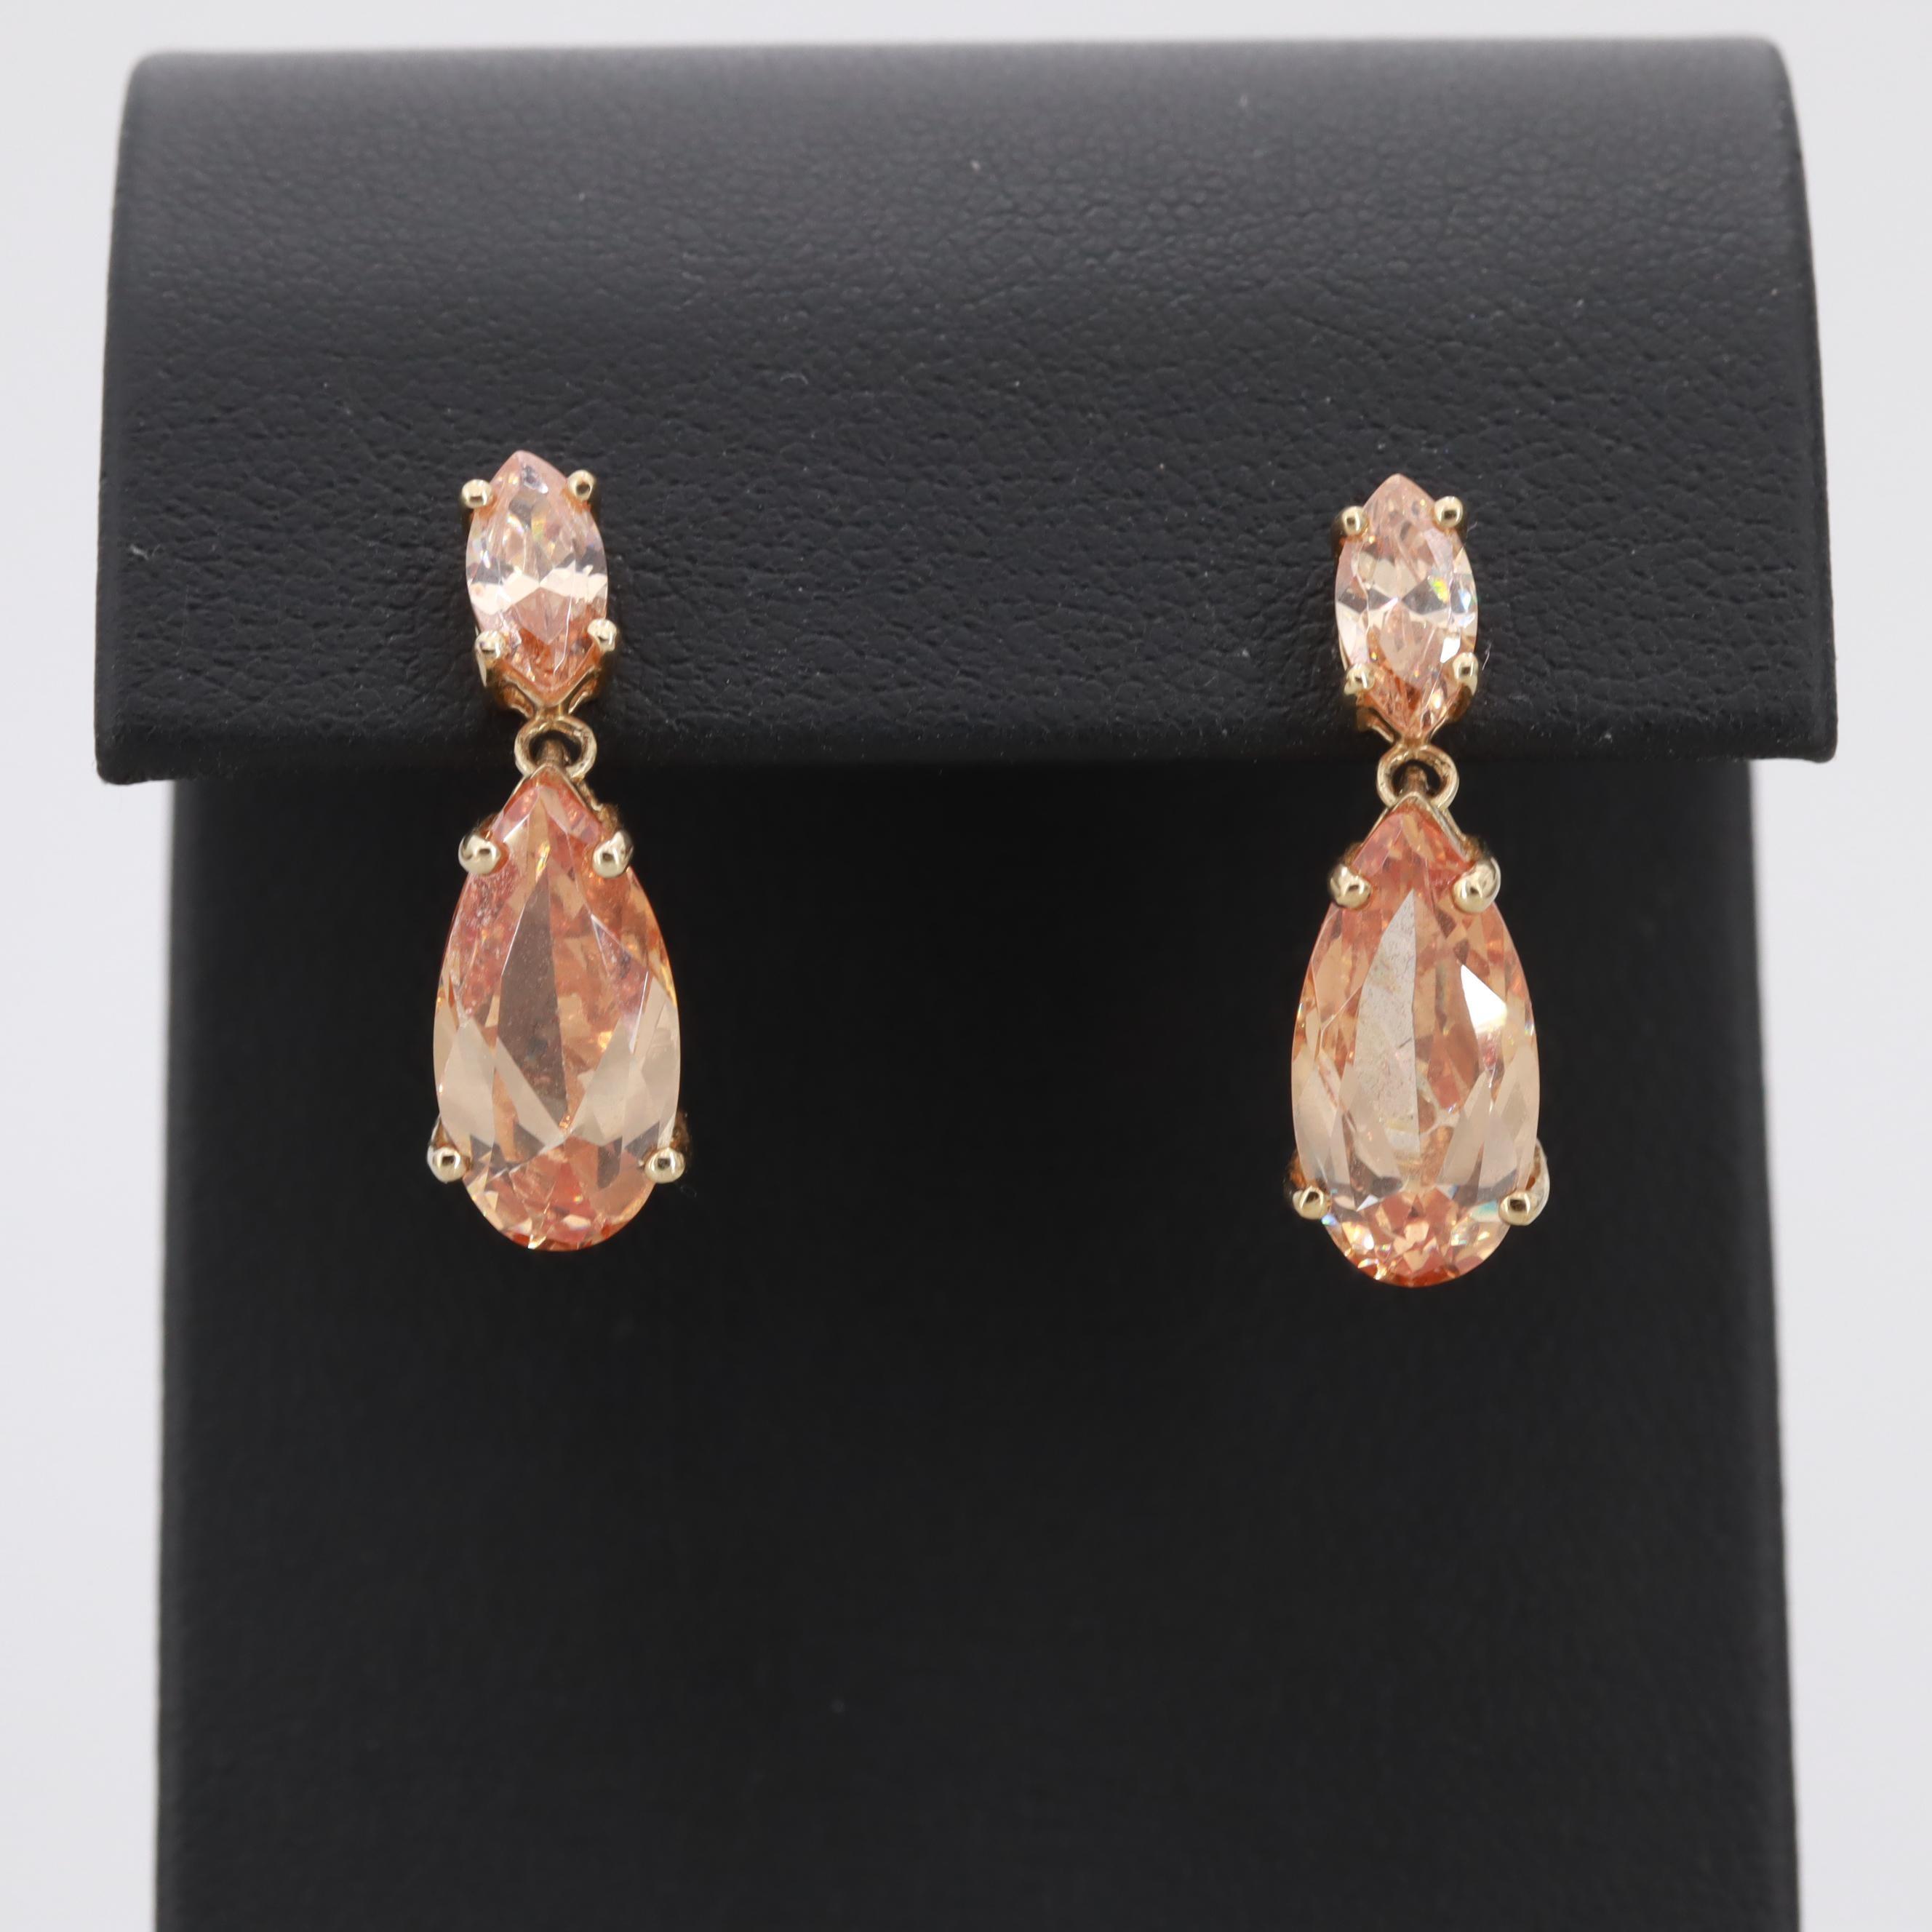 10K Yellow Gold Cubic Zirconia Dangle Earrings